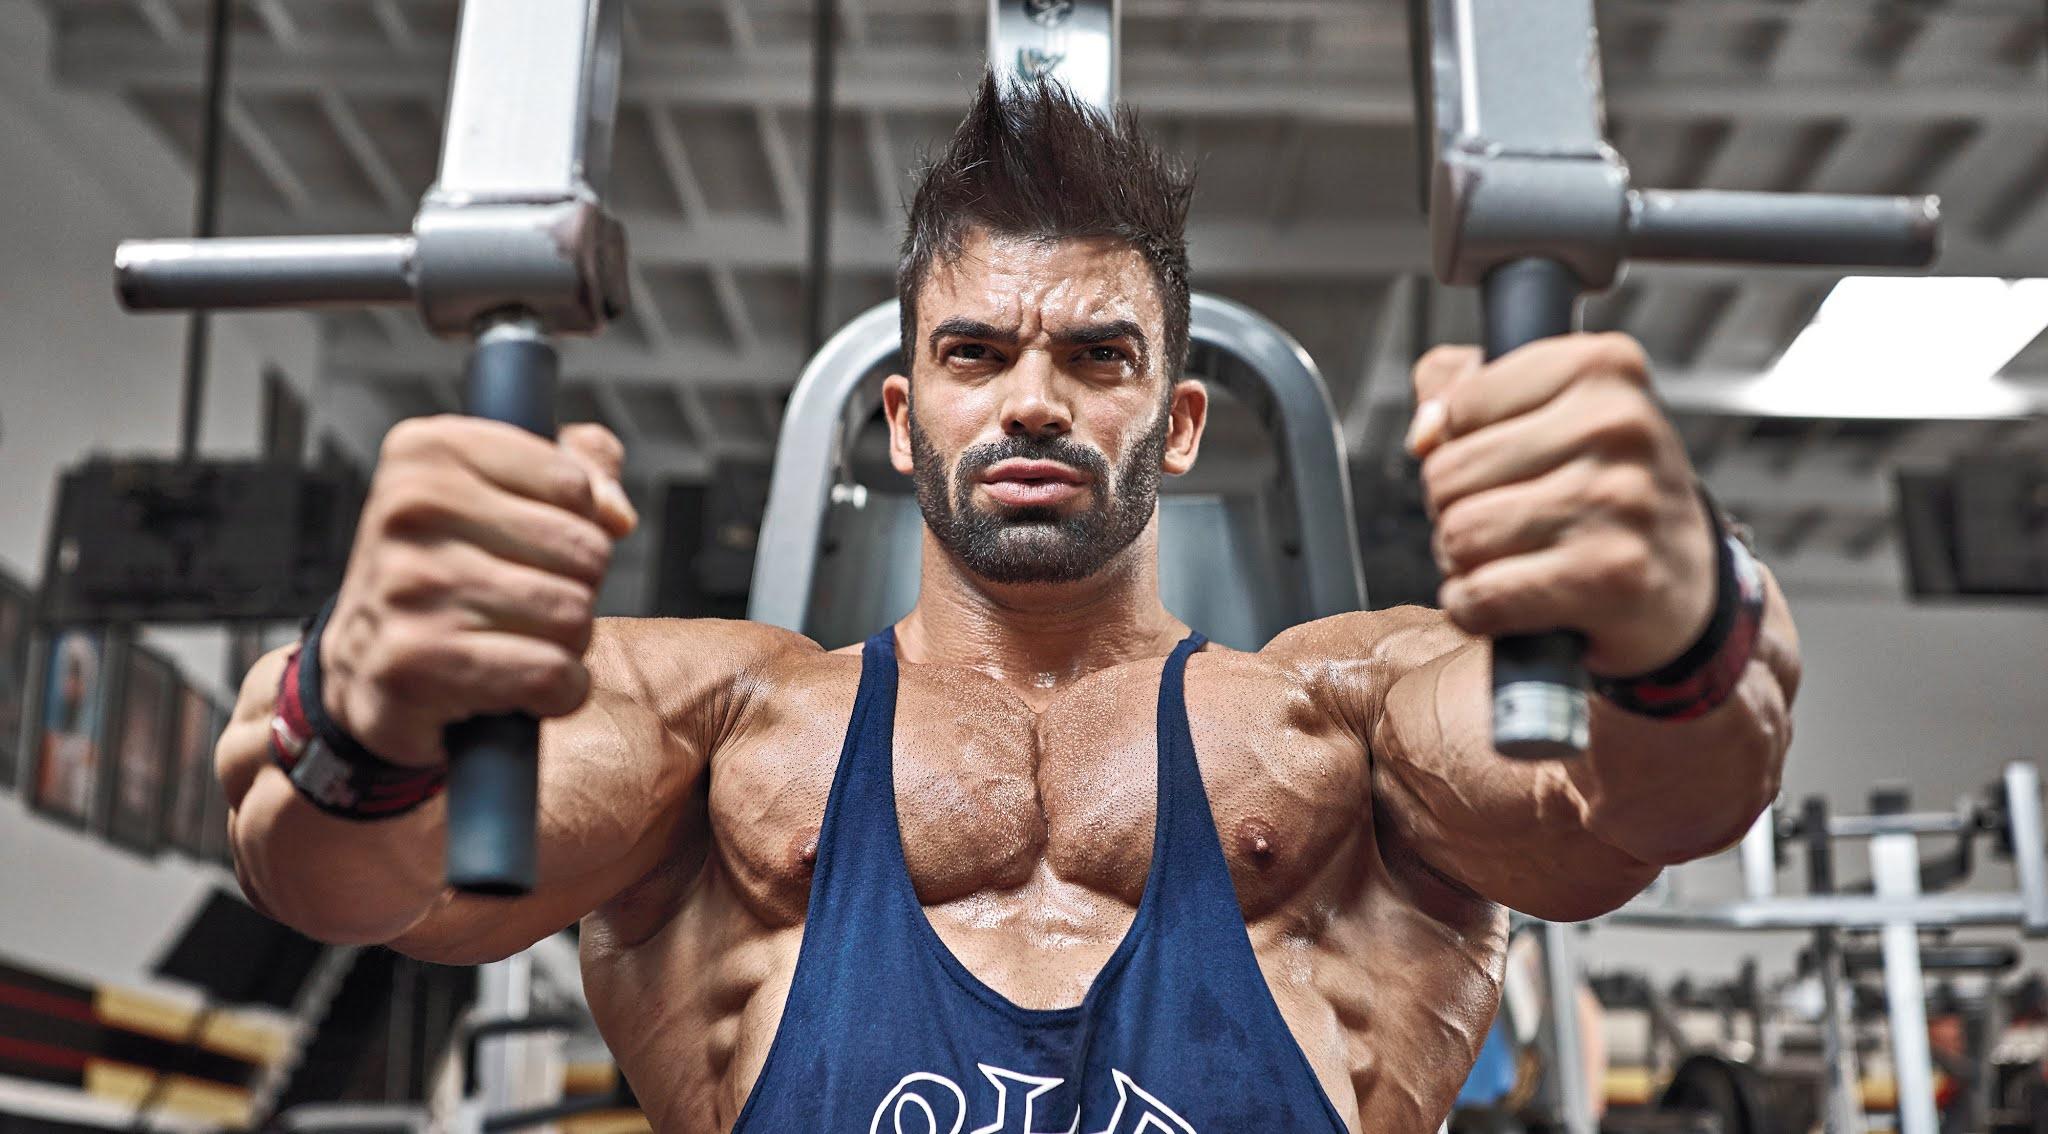 Sergi Constance gym workout routine